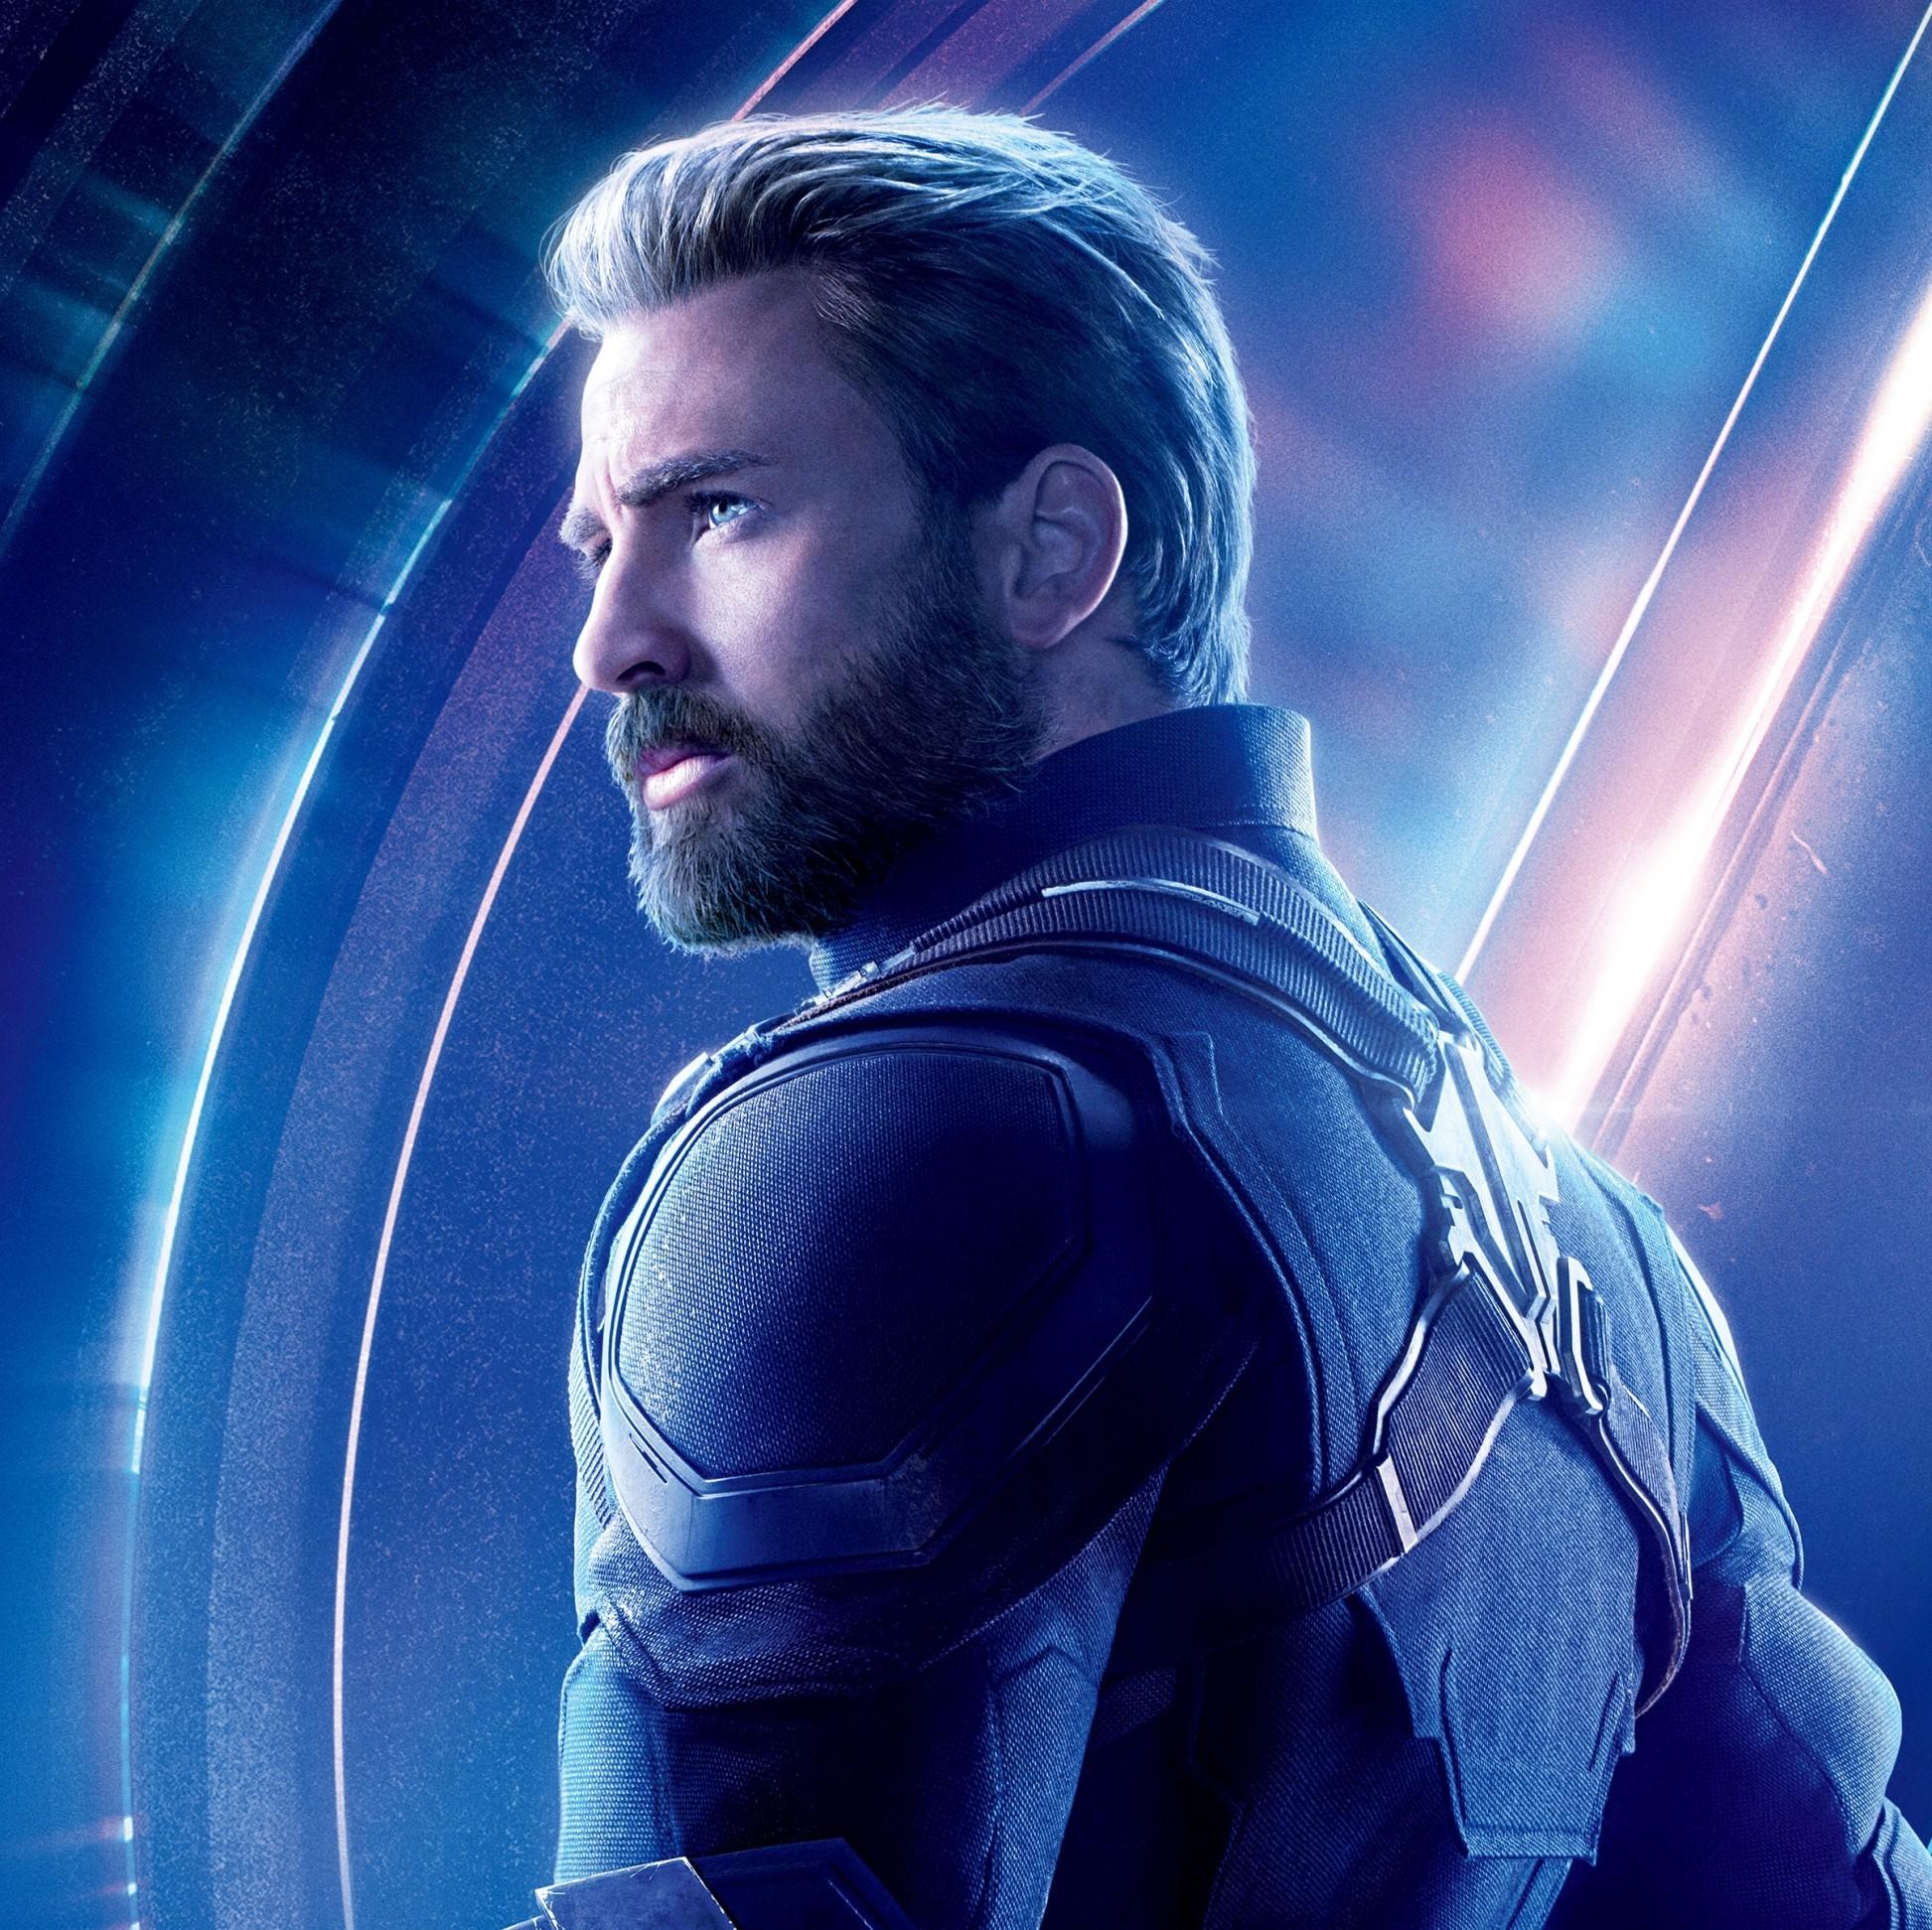 Download 1945x1943 Avengers Infinity War Captain America 1945x1943